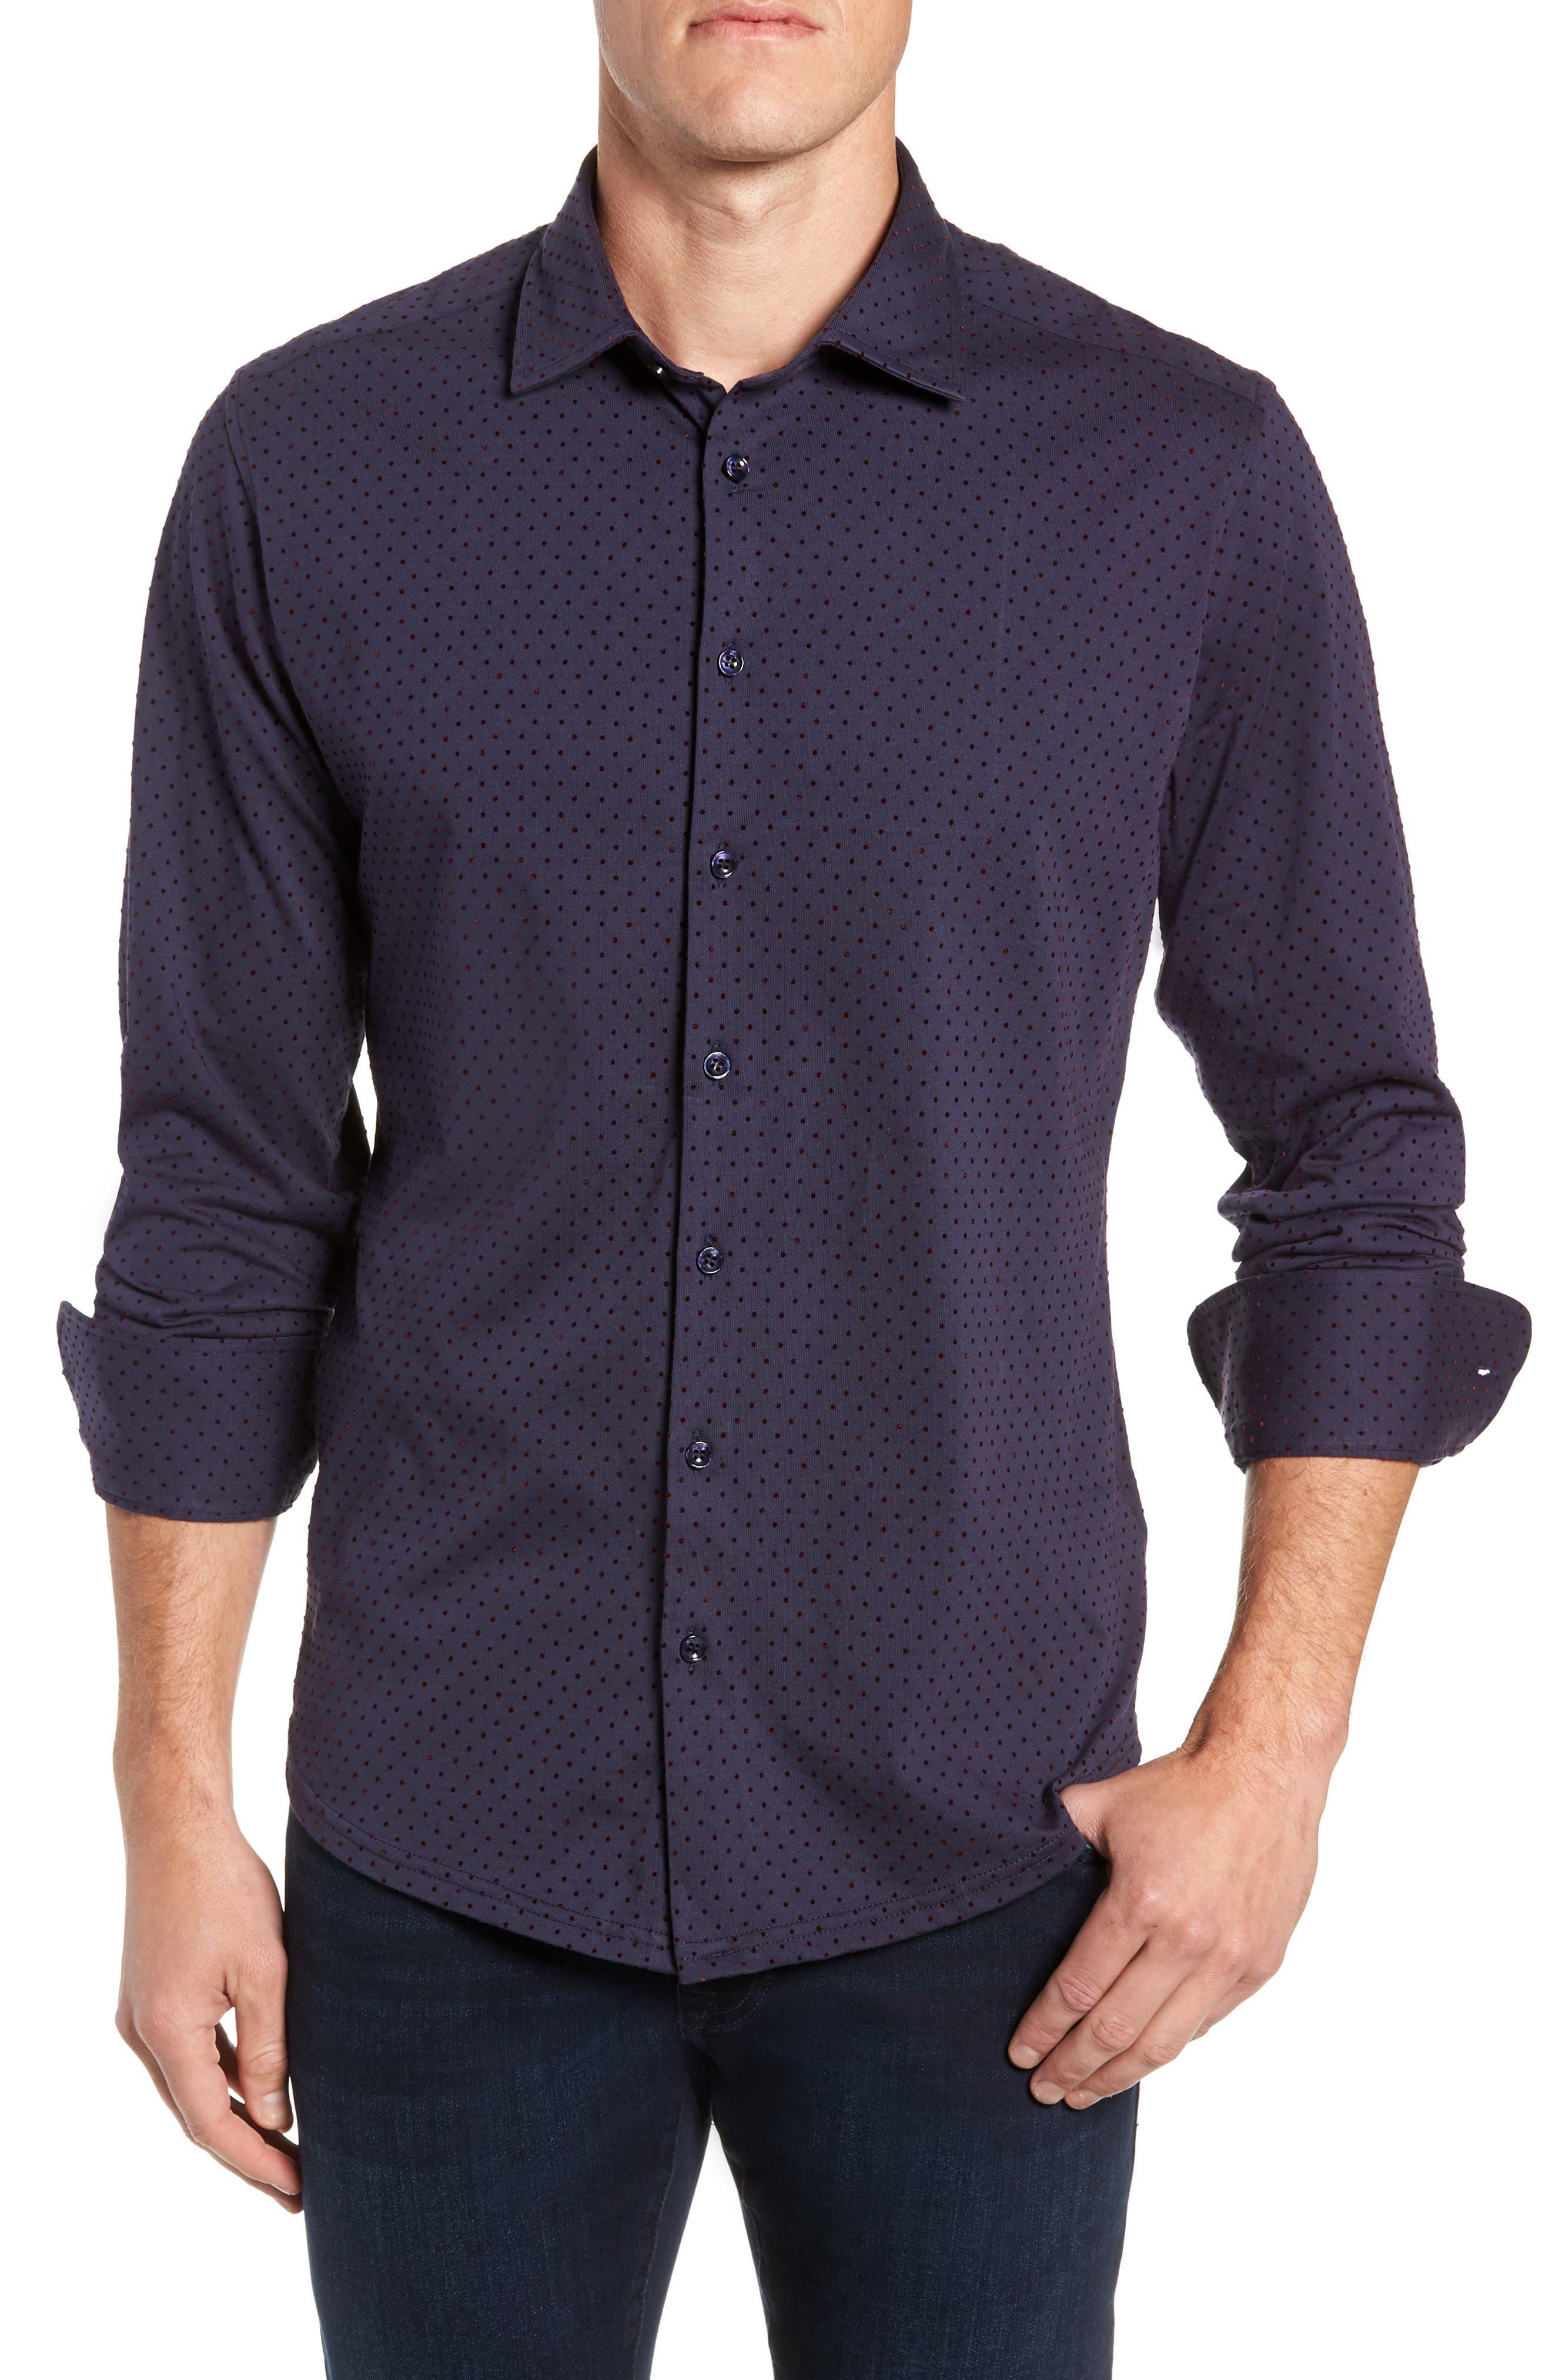 STONE ROSE Regular Fit Knit Sport Shirt, Main, color, NAVY